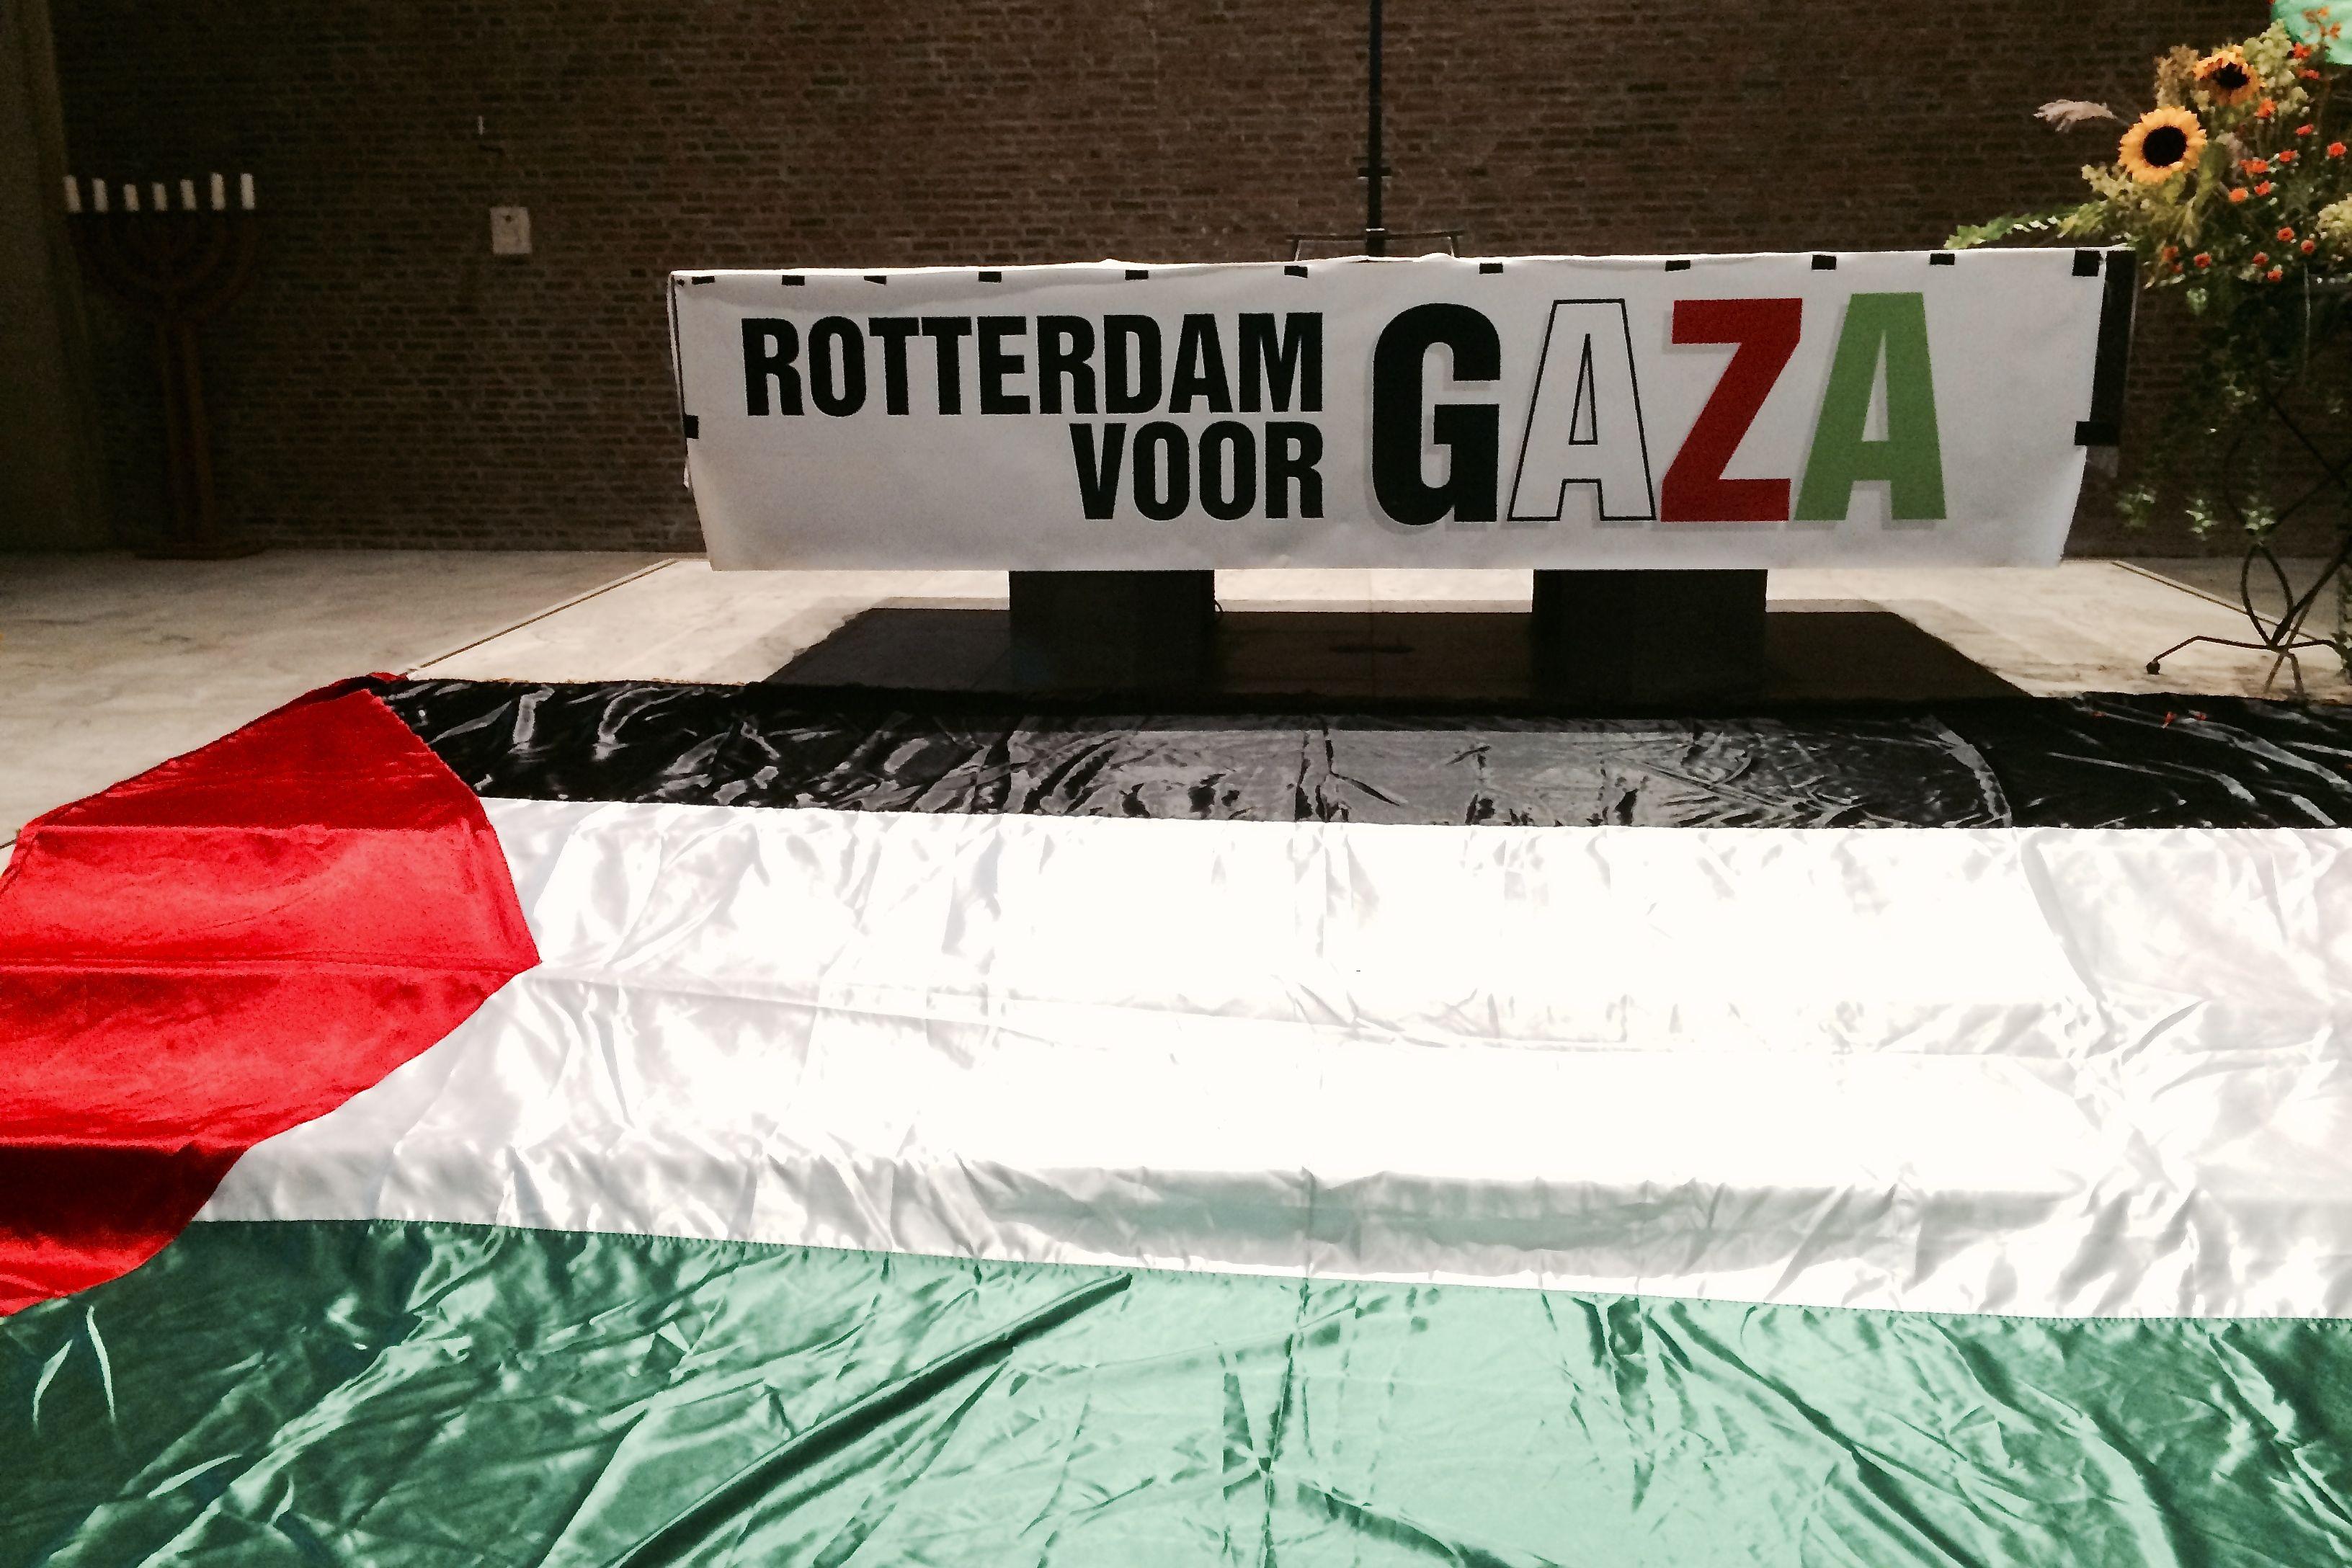 Rotterdam voor Gaza - Gaza Palestina Israel Rotterdam